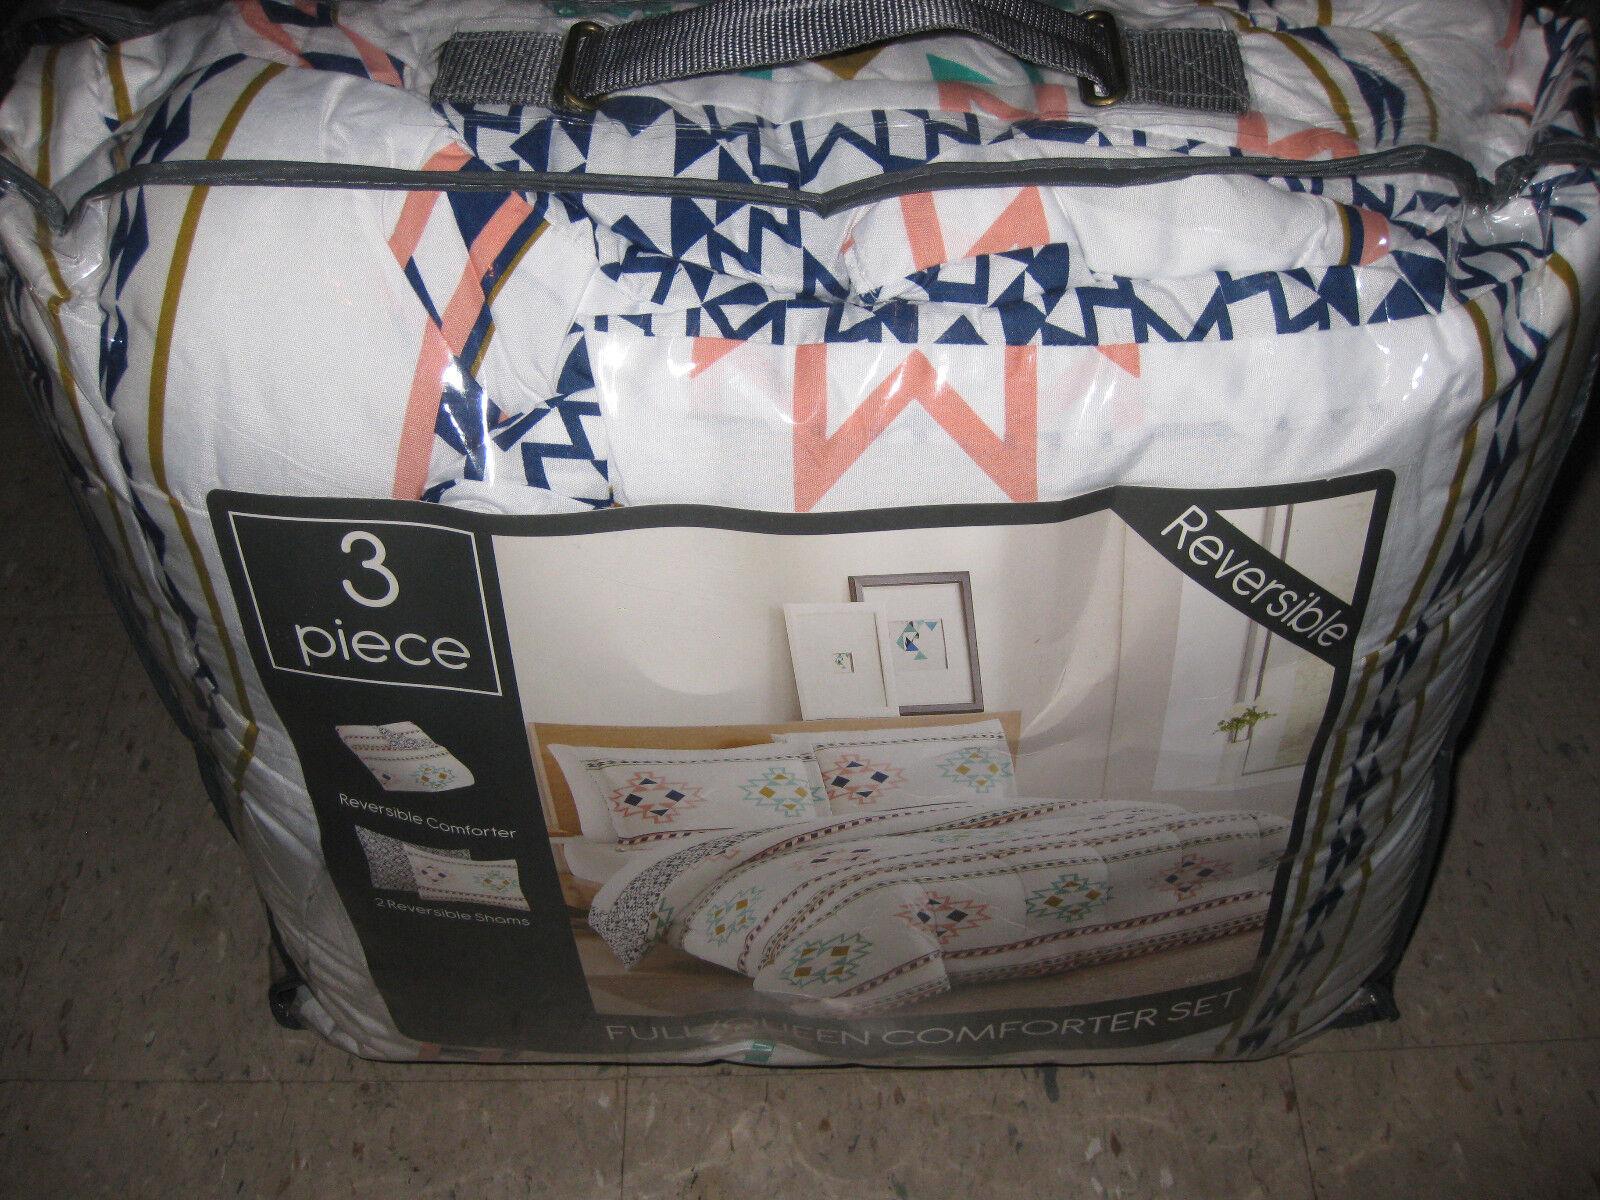 NEW- Multi Blau REVERSIBLE- 3 PIECE Queen Full Comforter Bed Set 2 pillow sham